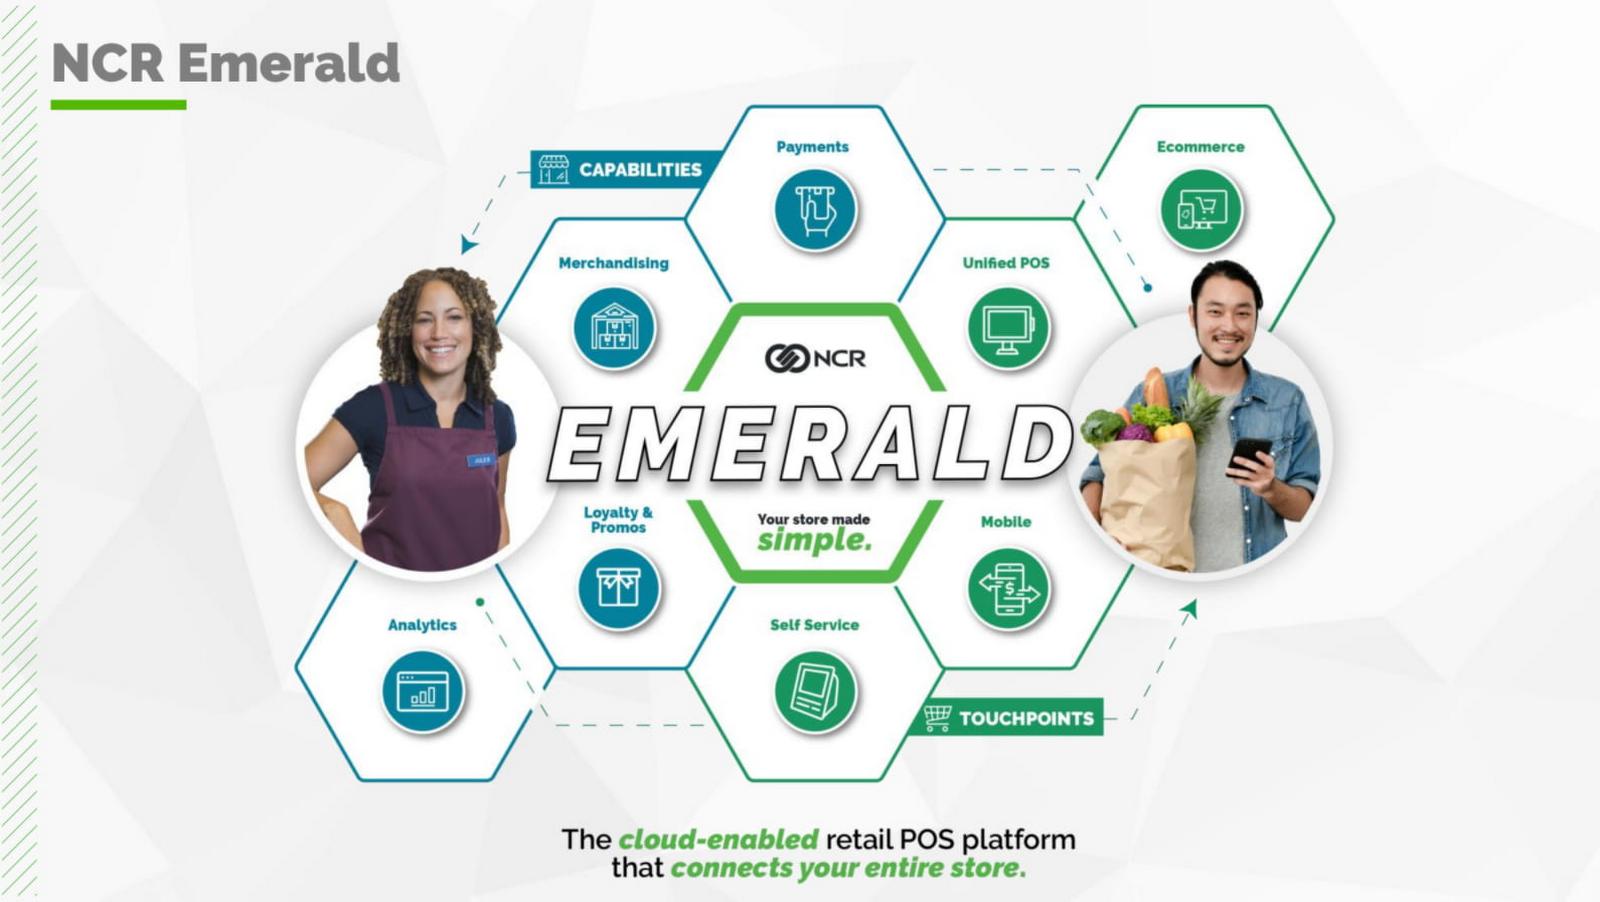 ncr emerald.jpg